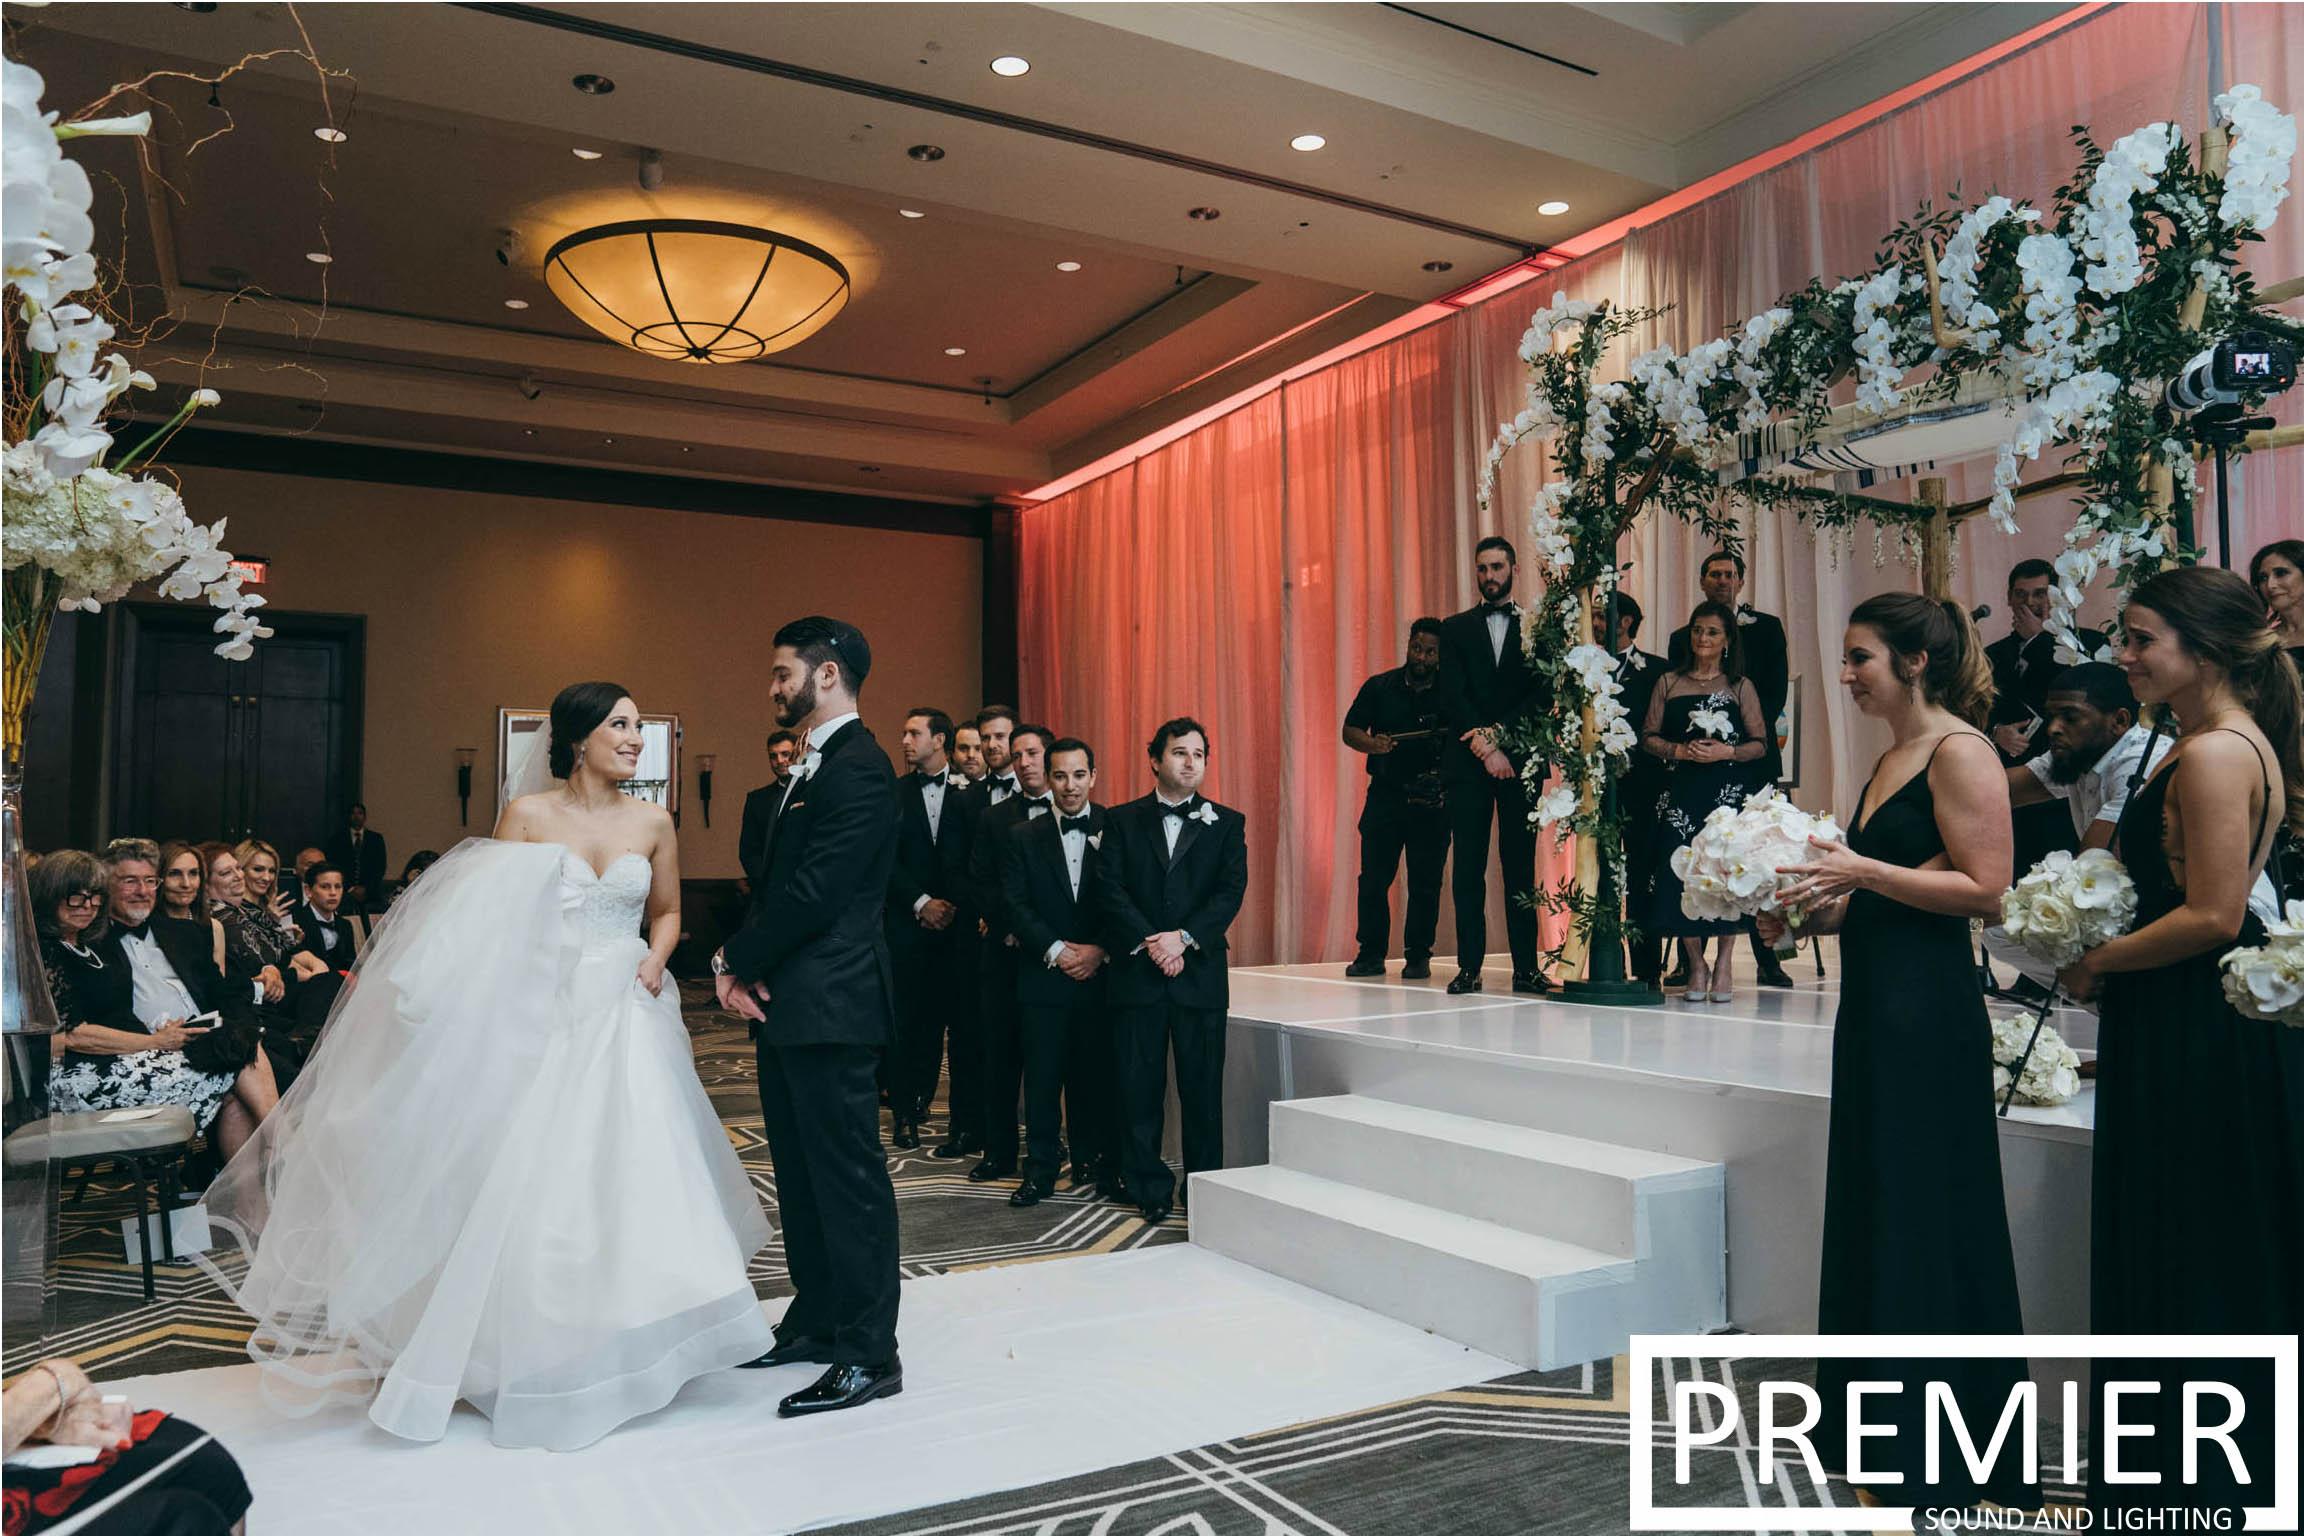 Premier Sound And Lighting Houston Wedding 10